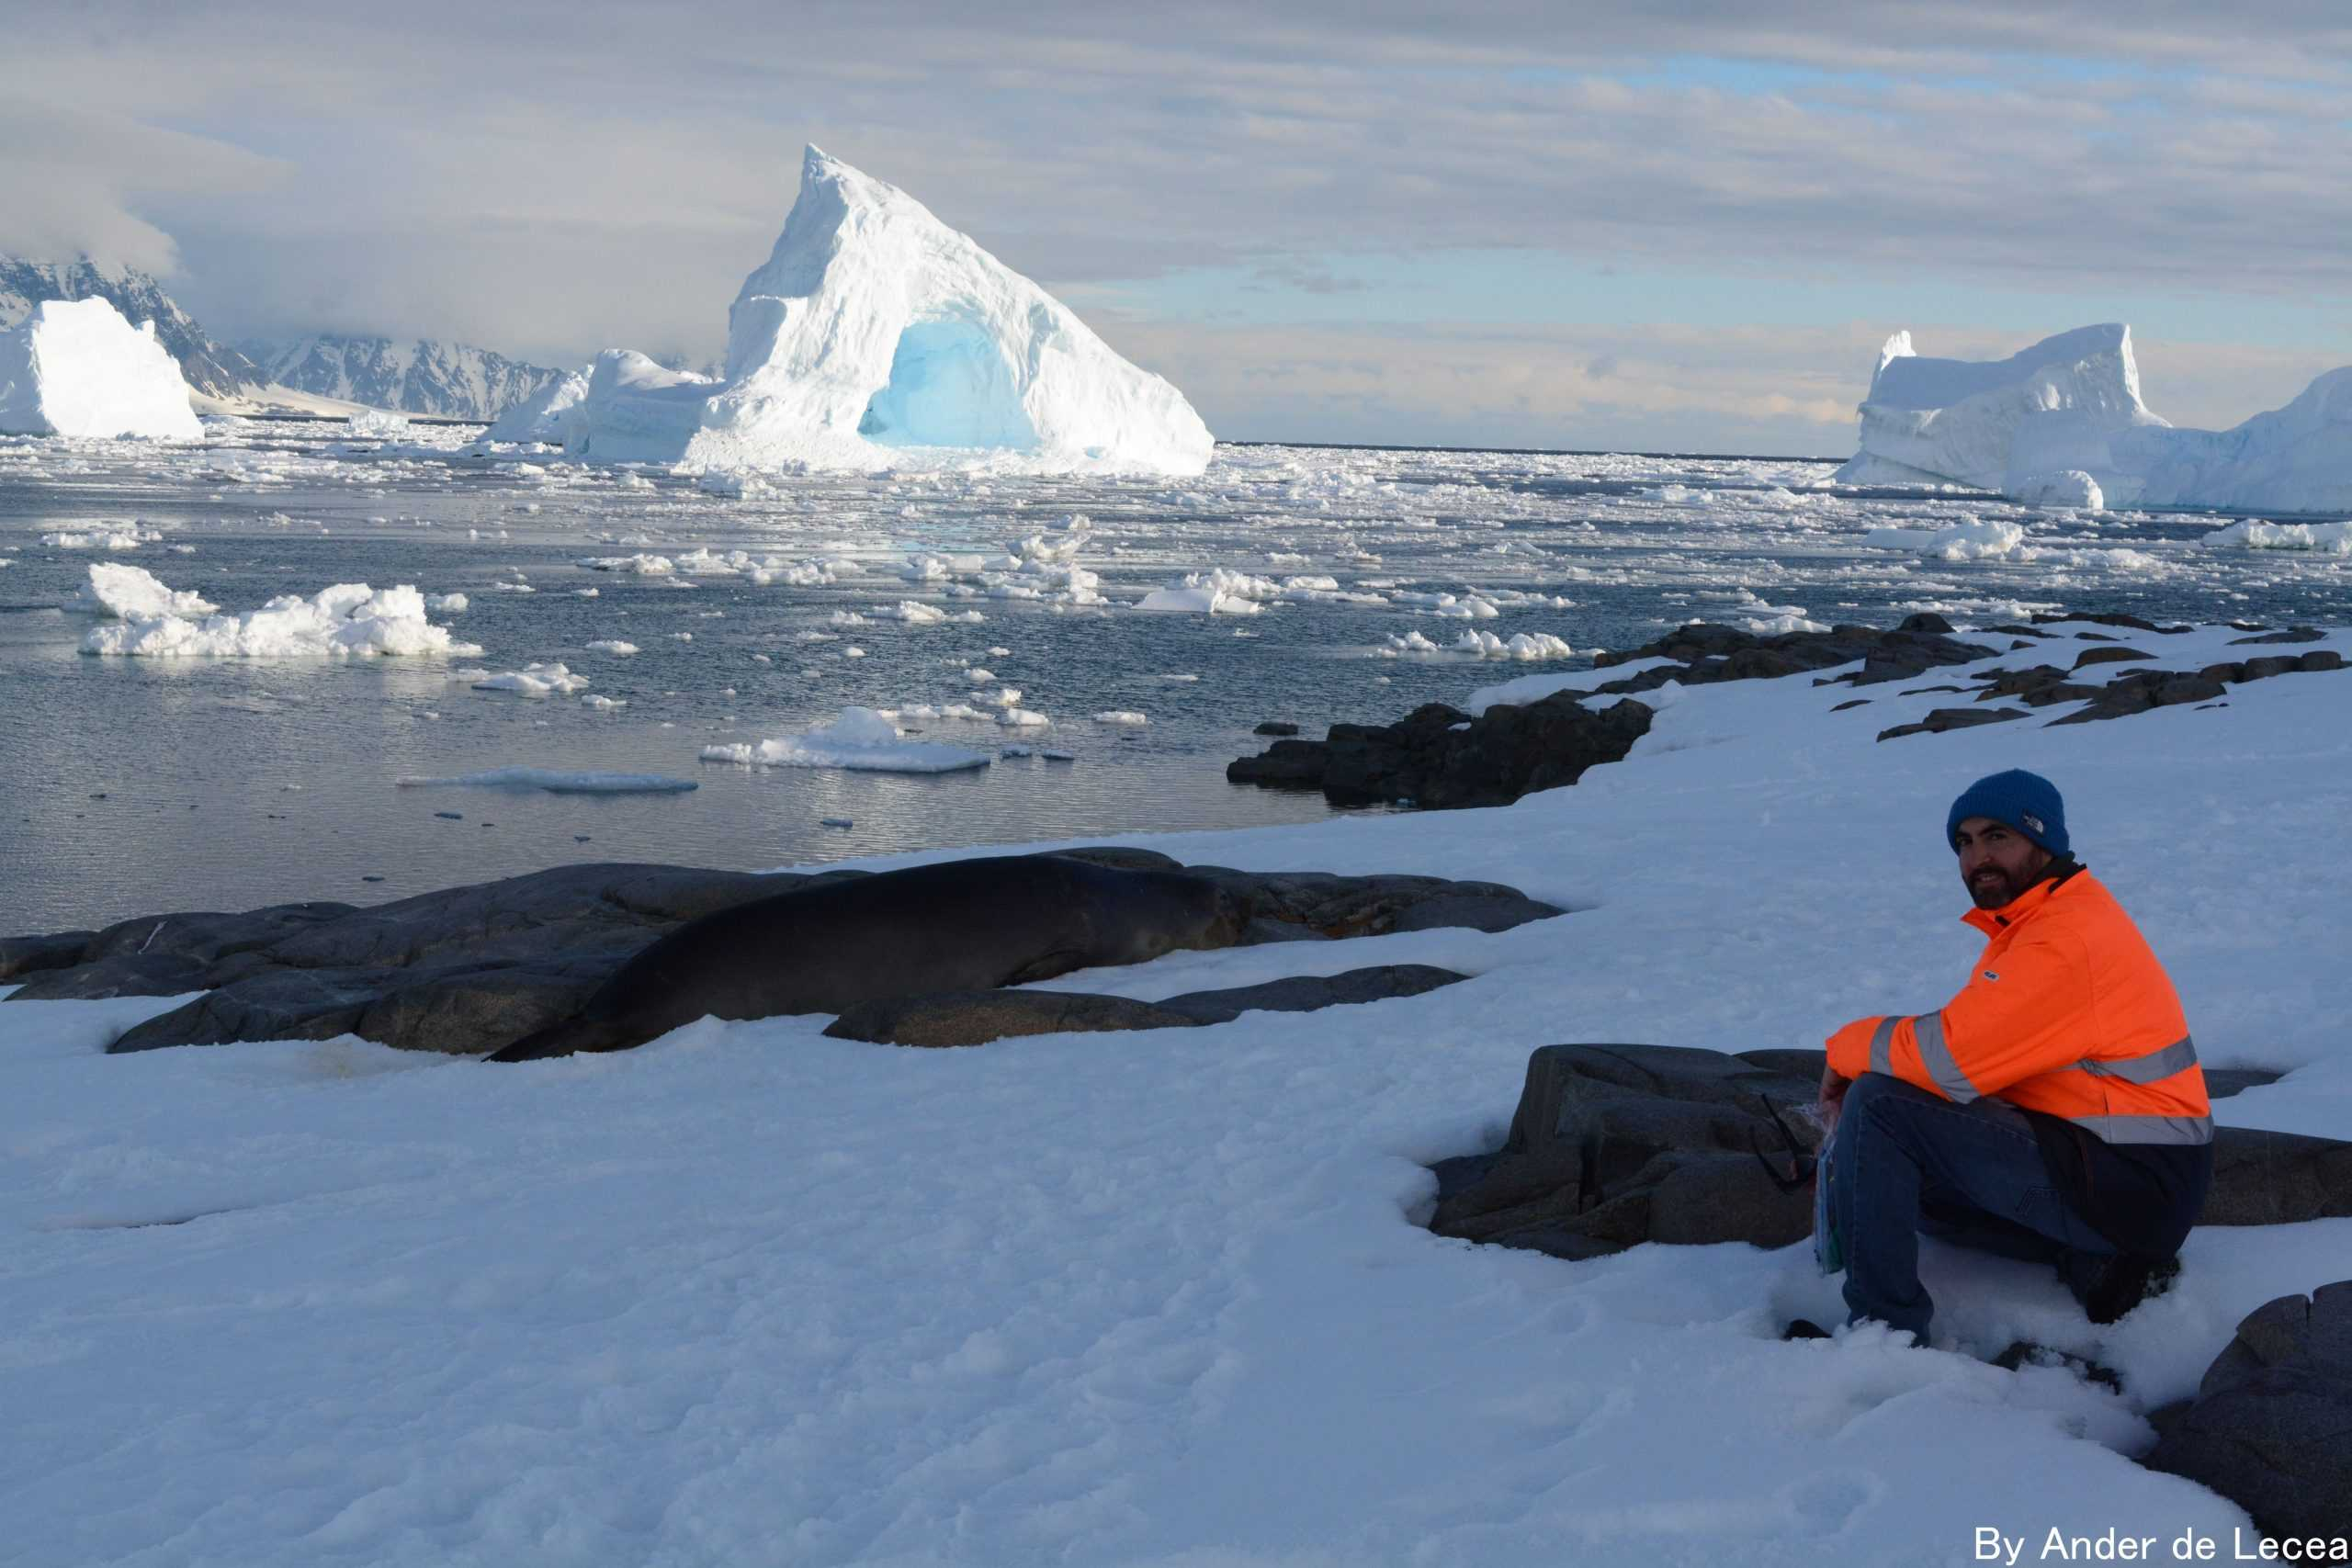 Cancelan dos eventos científicos que se realizarían en Punta Arenas